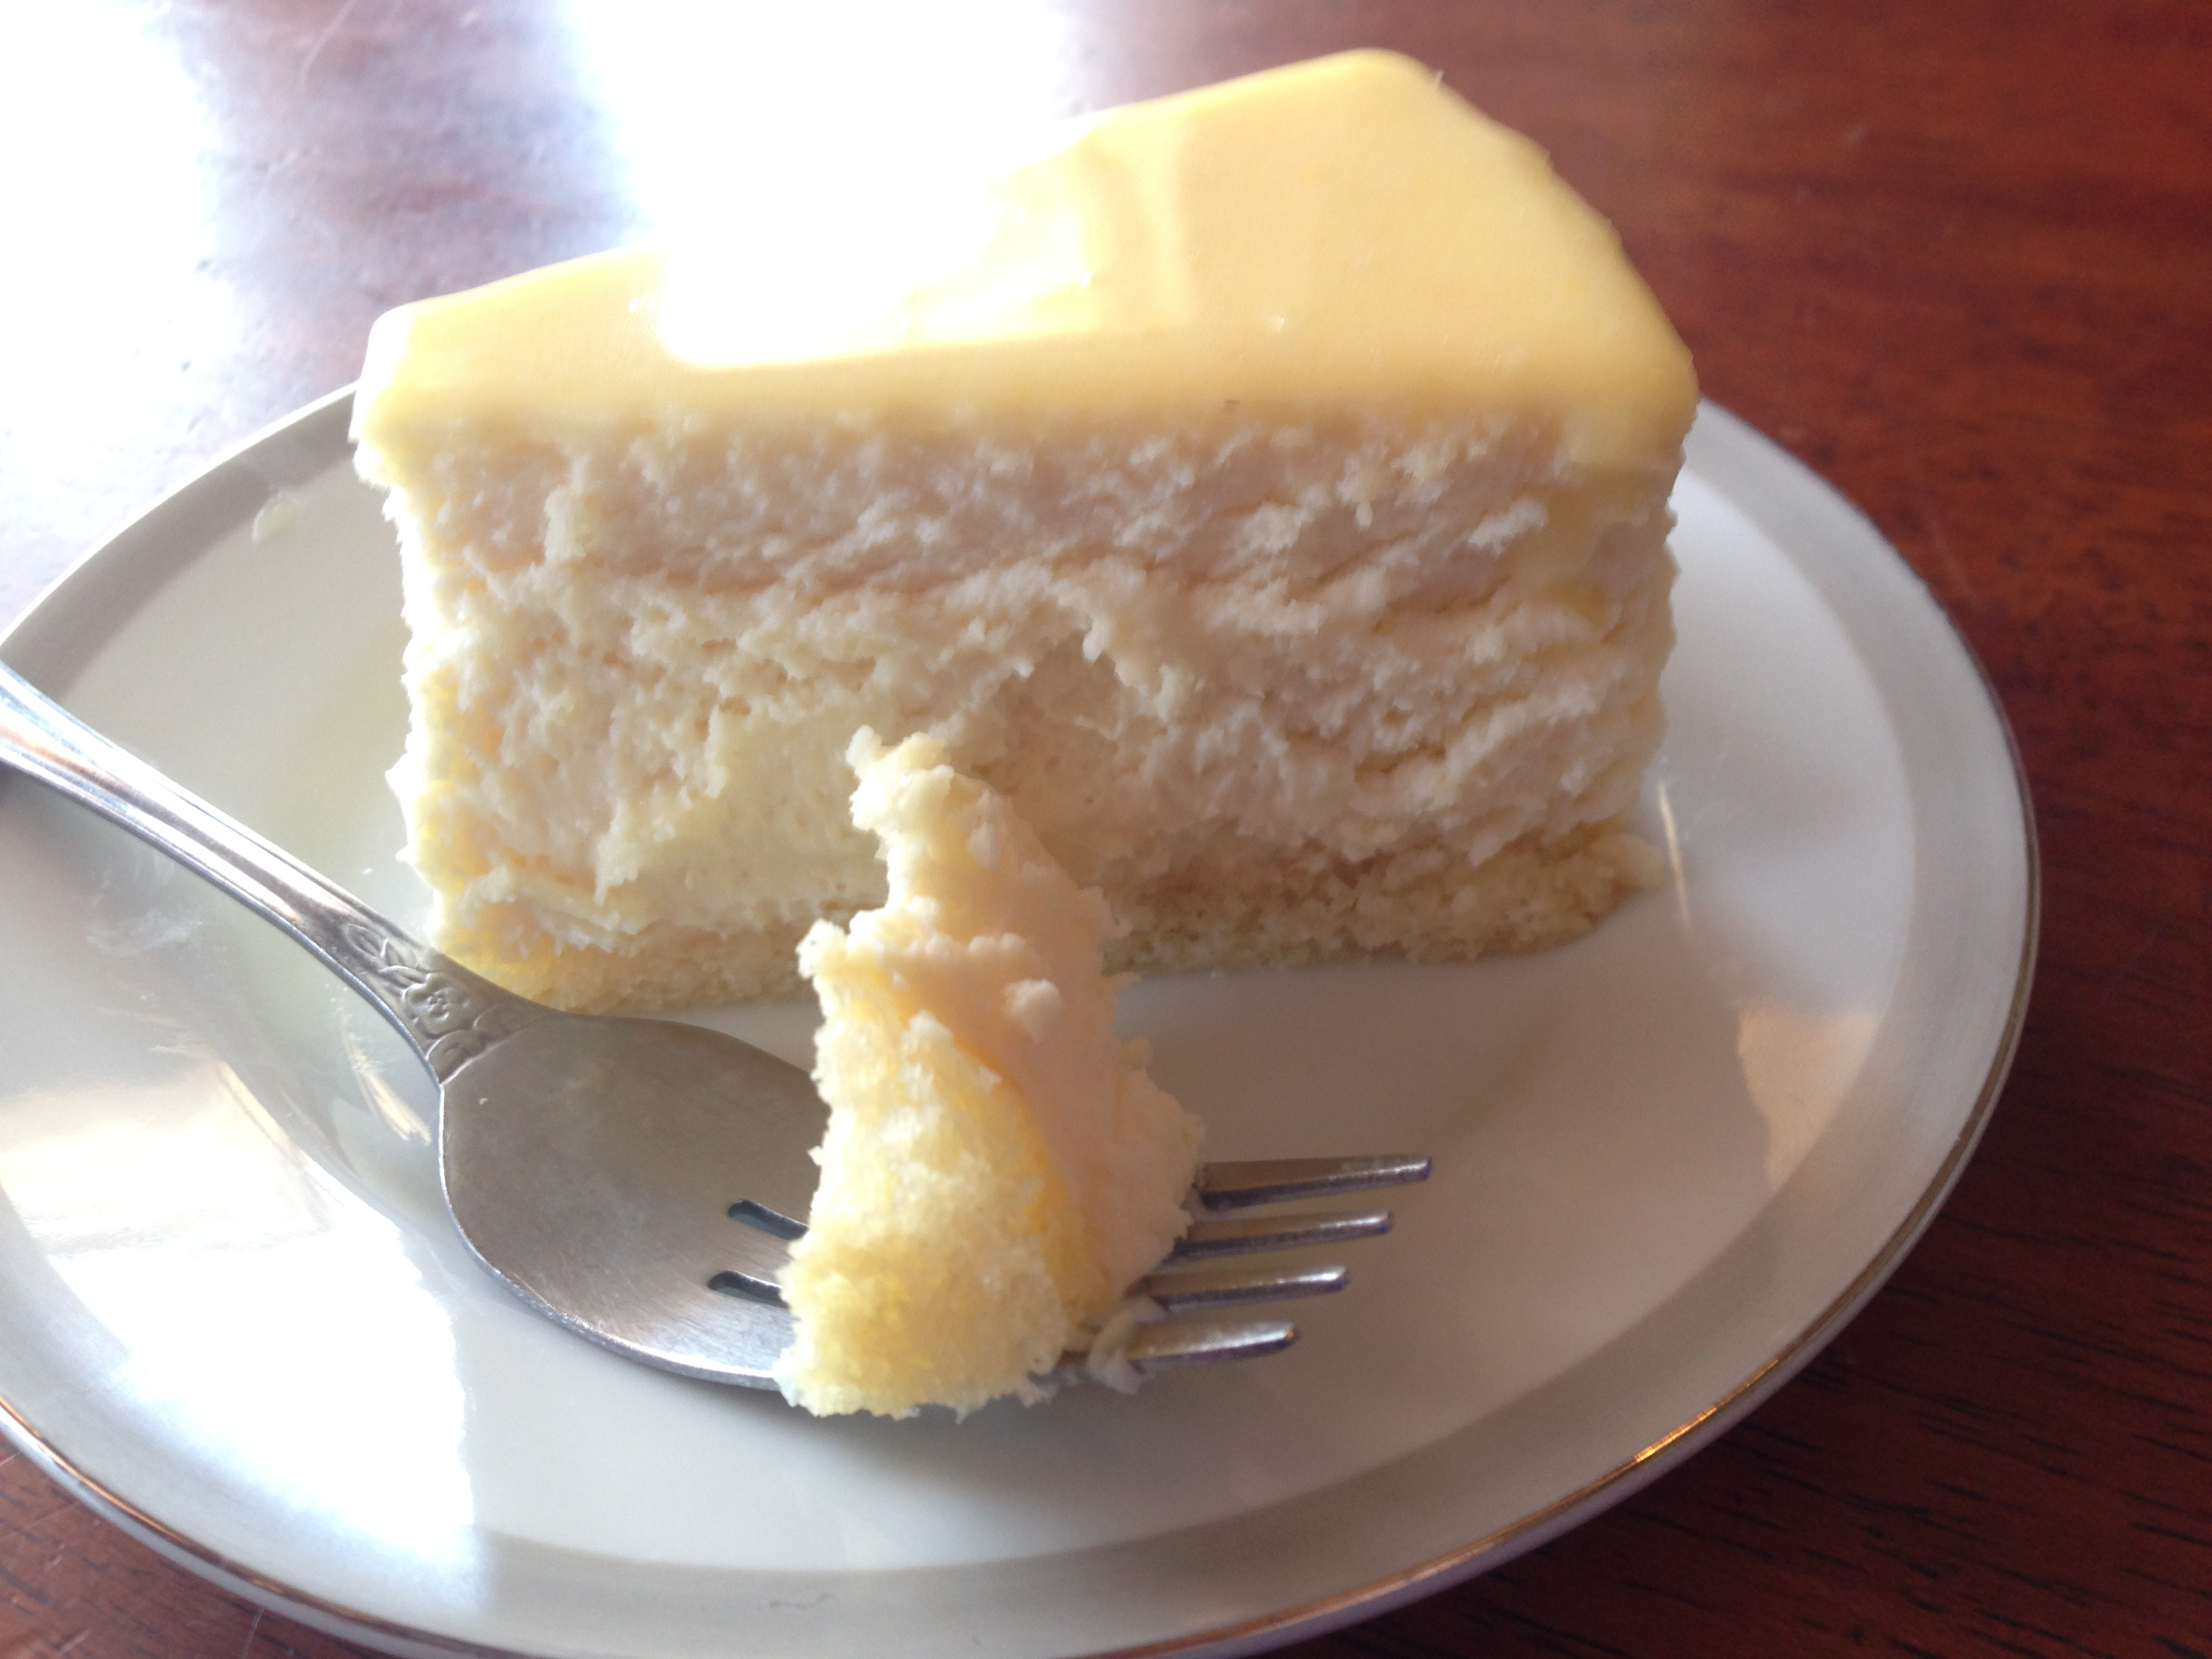 Home / Menu /Shop / Cheesecakes / Lemon Cheesecake